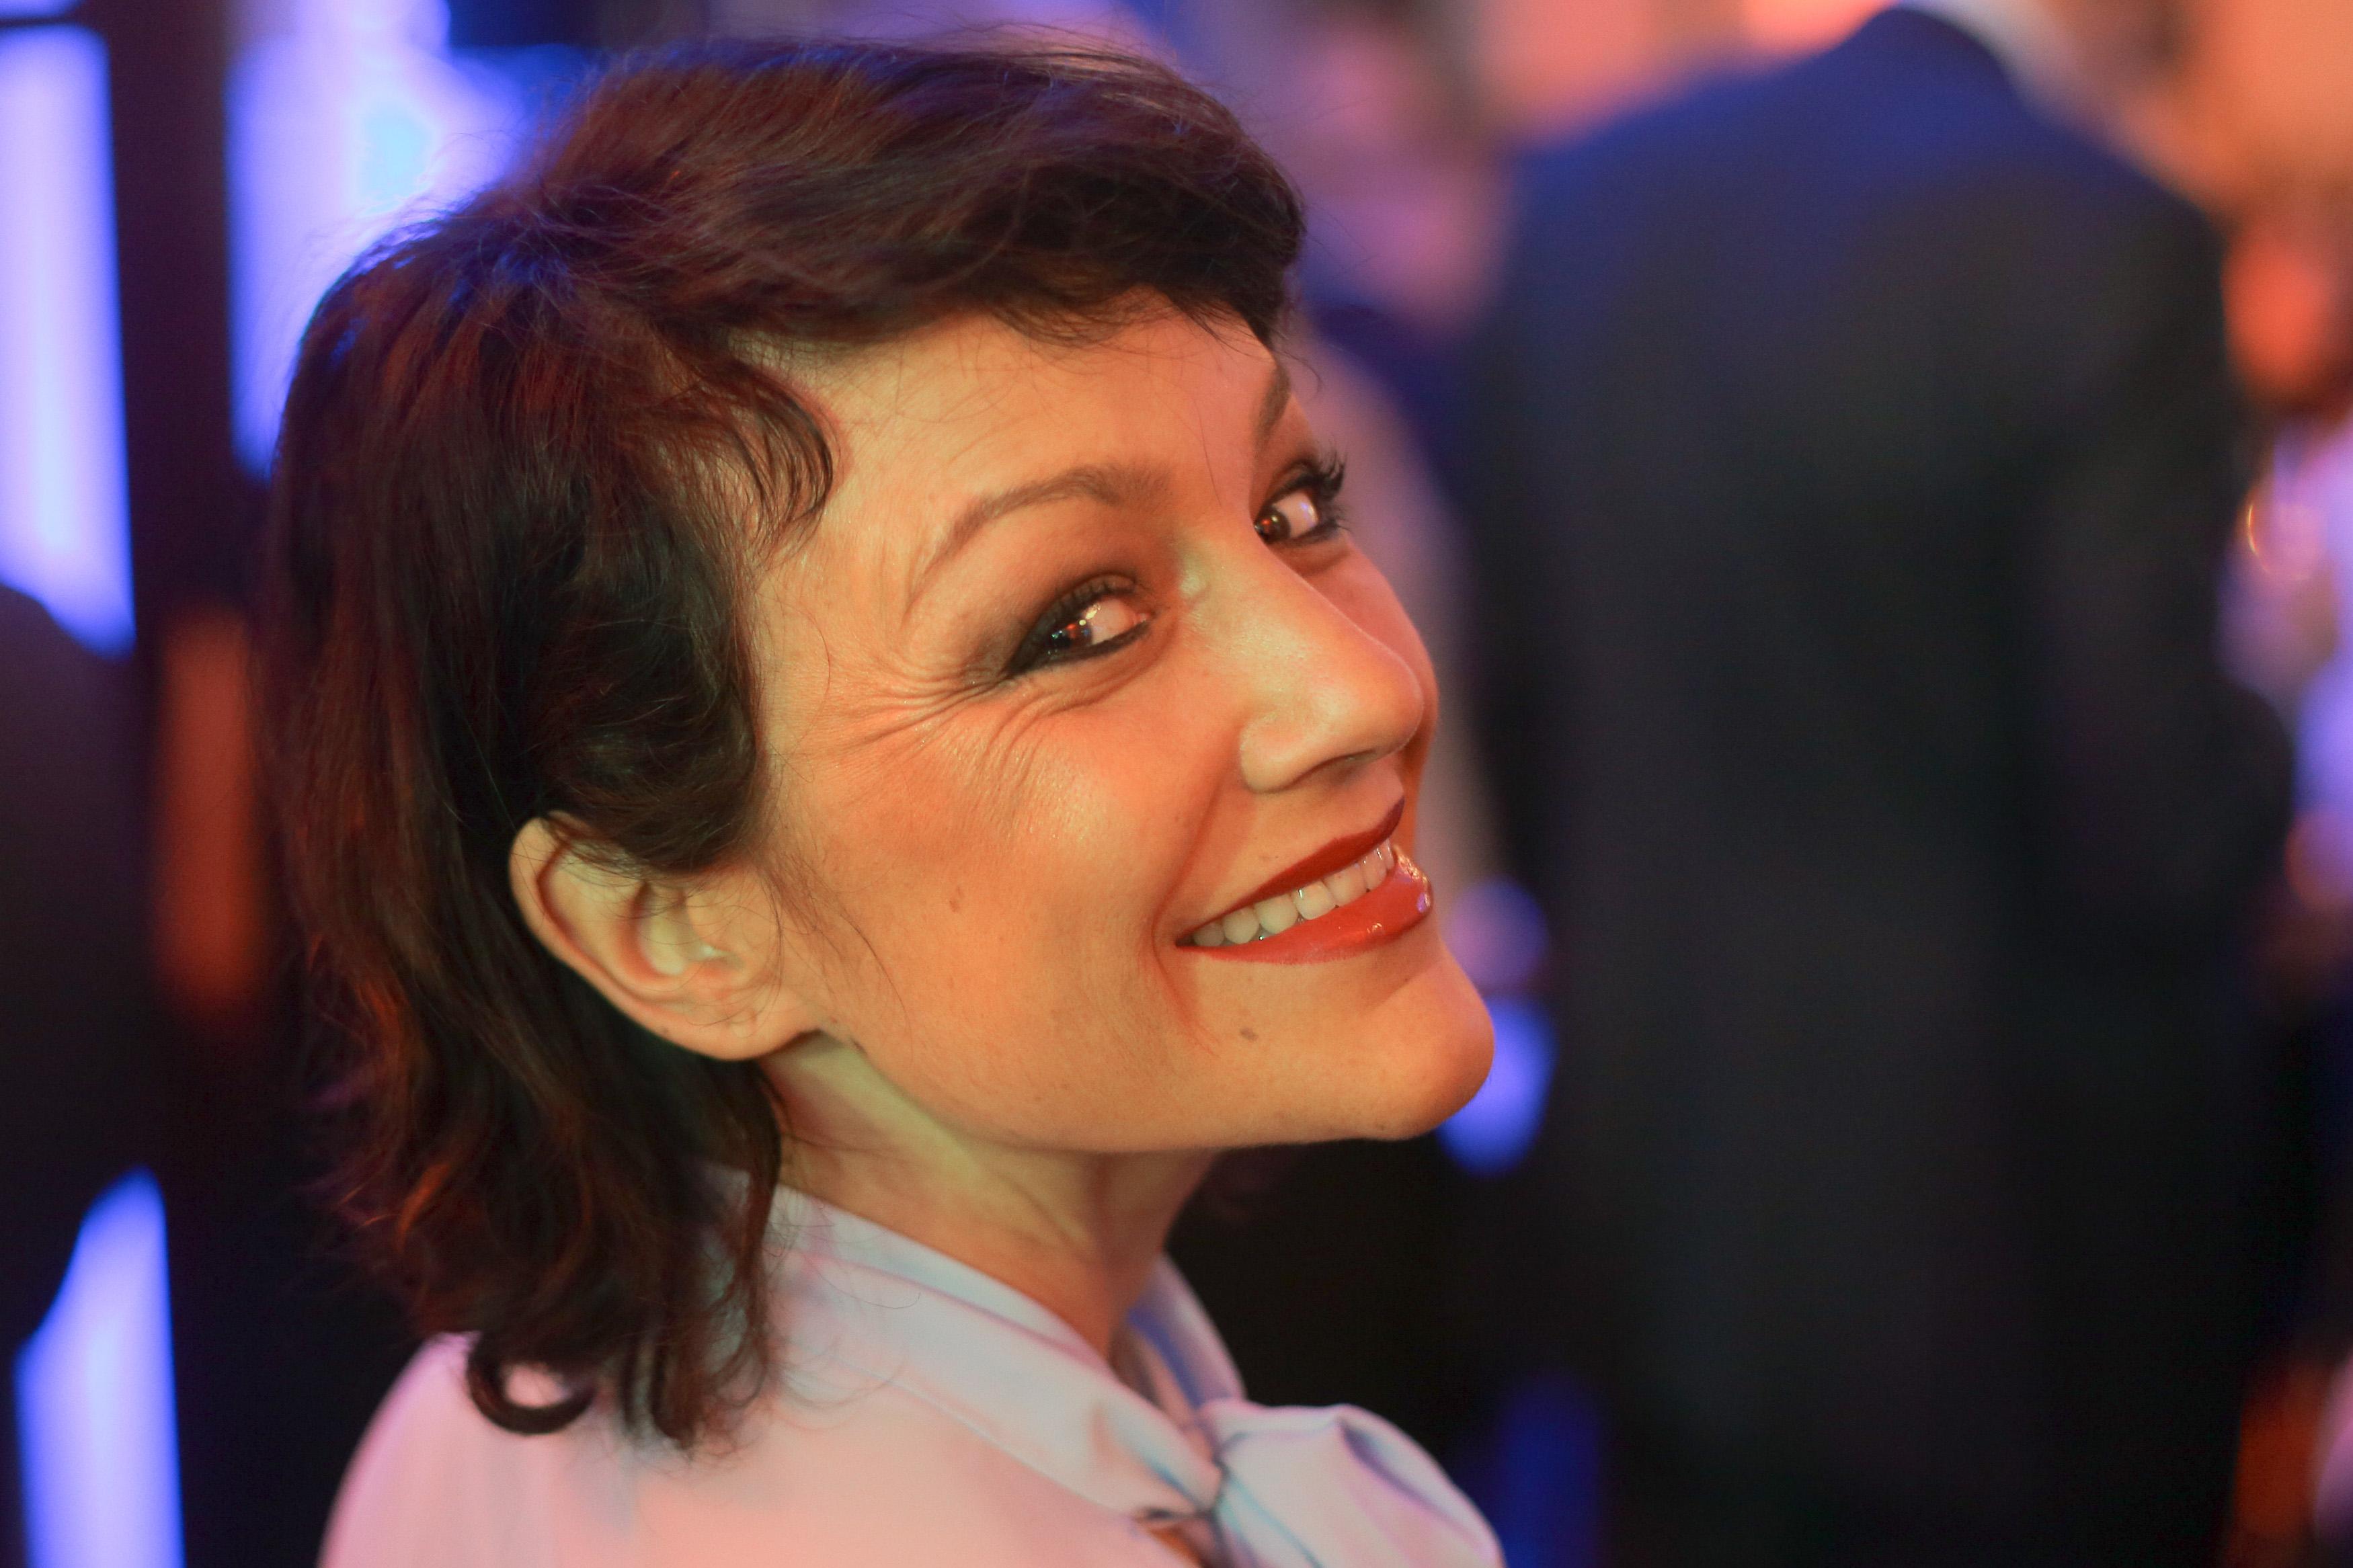 Miriam Pielhau * 12. Mai 1975 in Heidelberg; † 12. Juli 2016)